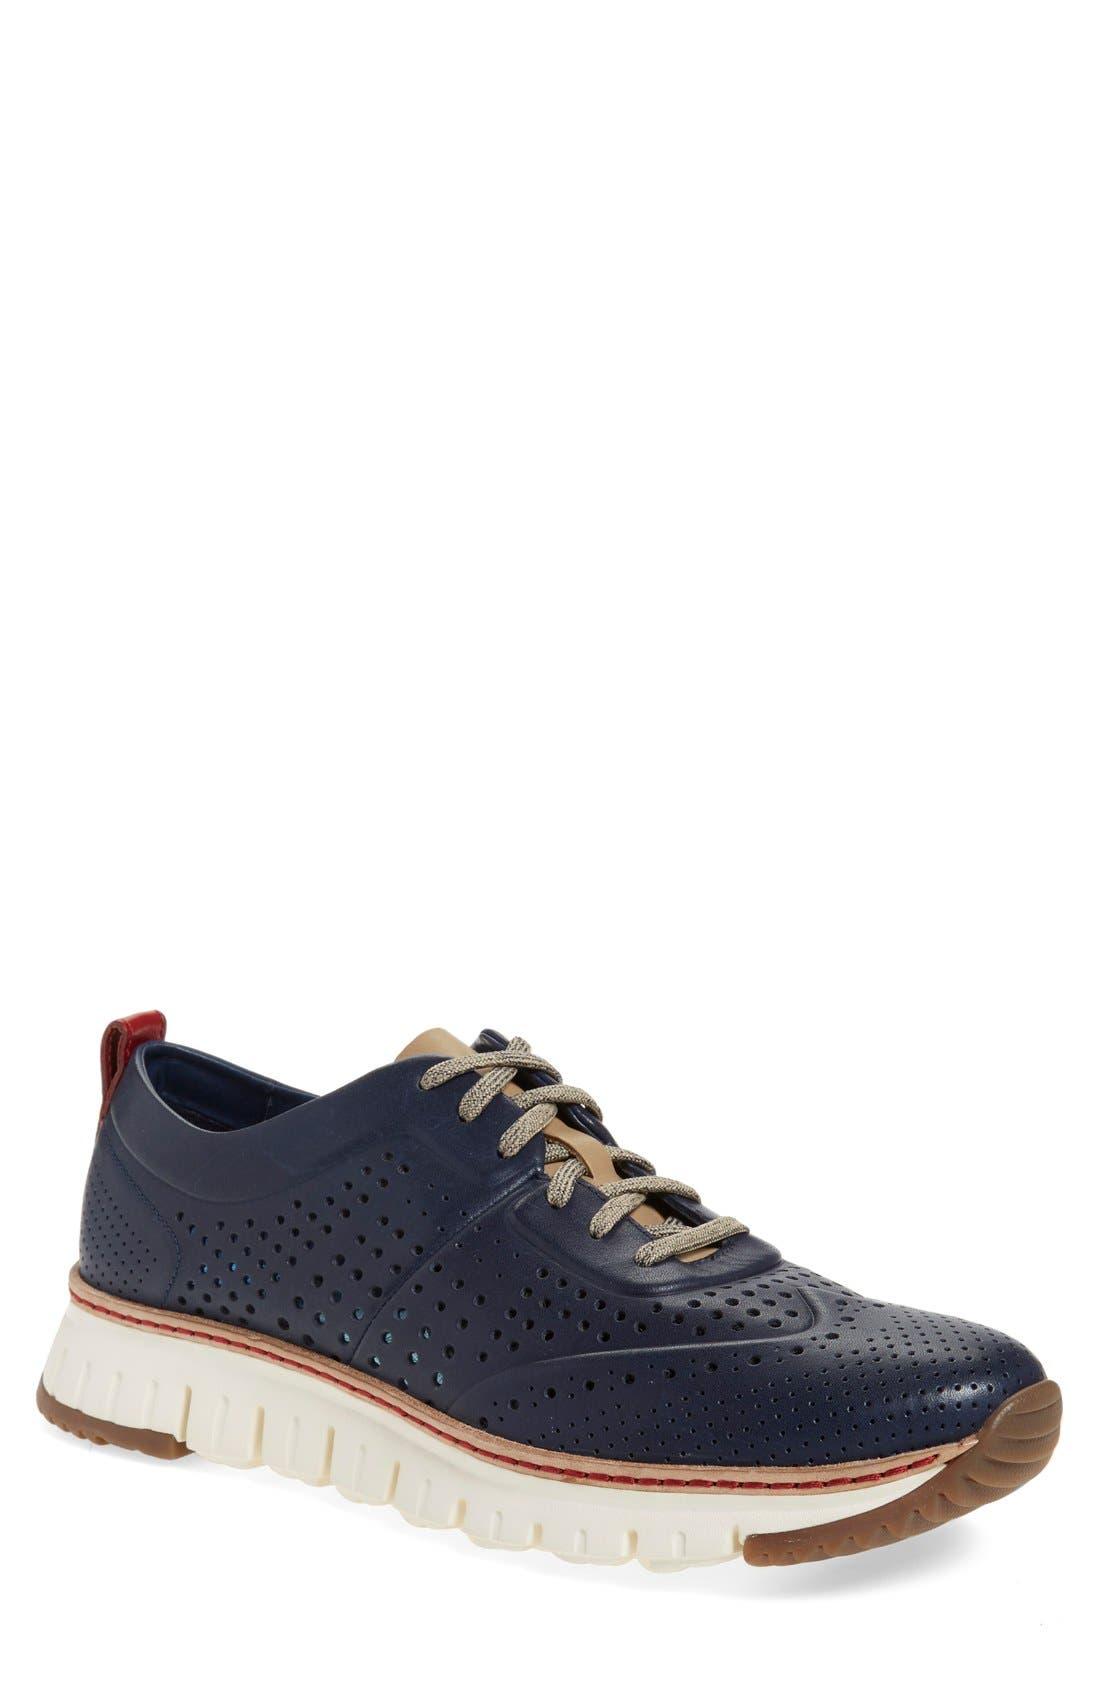 COLE HAAN 'ZerøGrand' Perforated Wingtip Sneaker, Main, color, 400